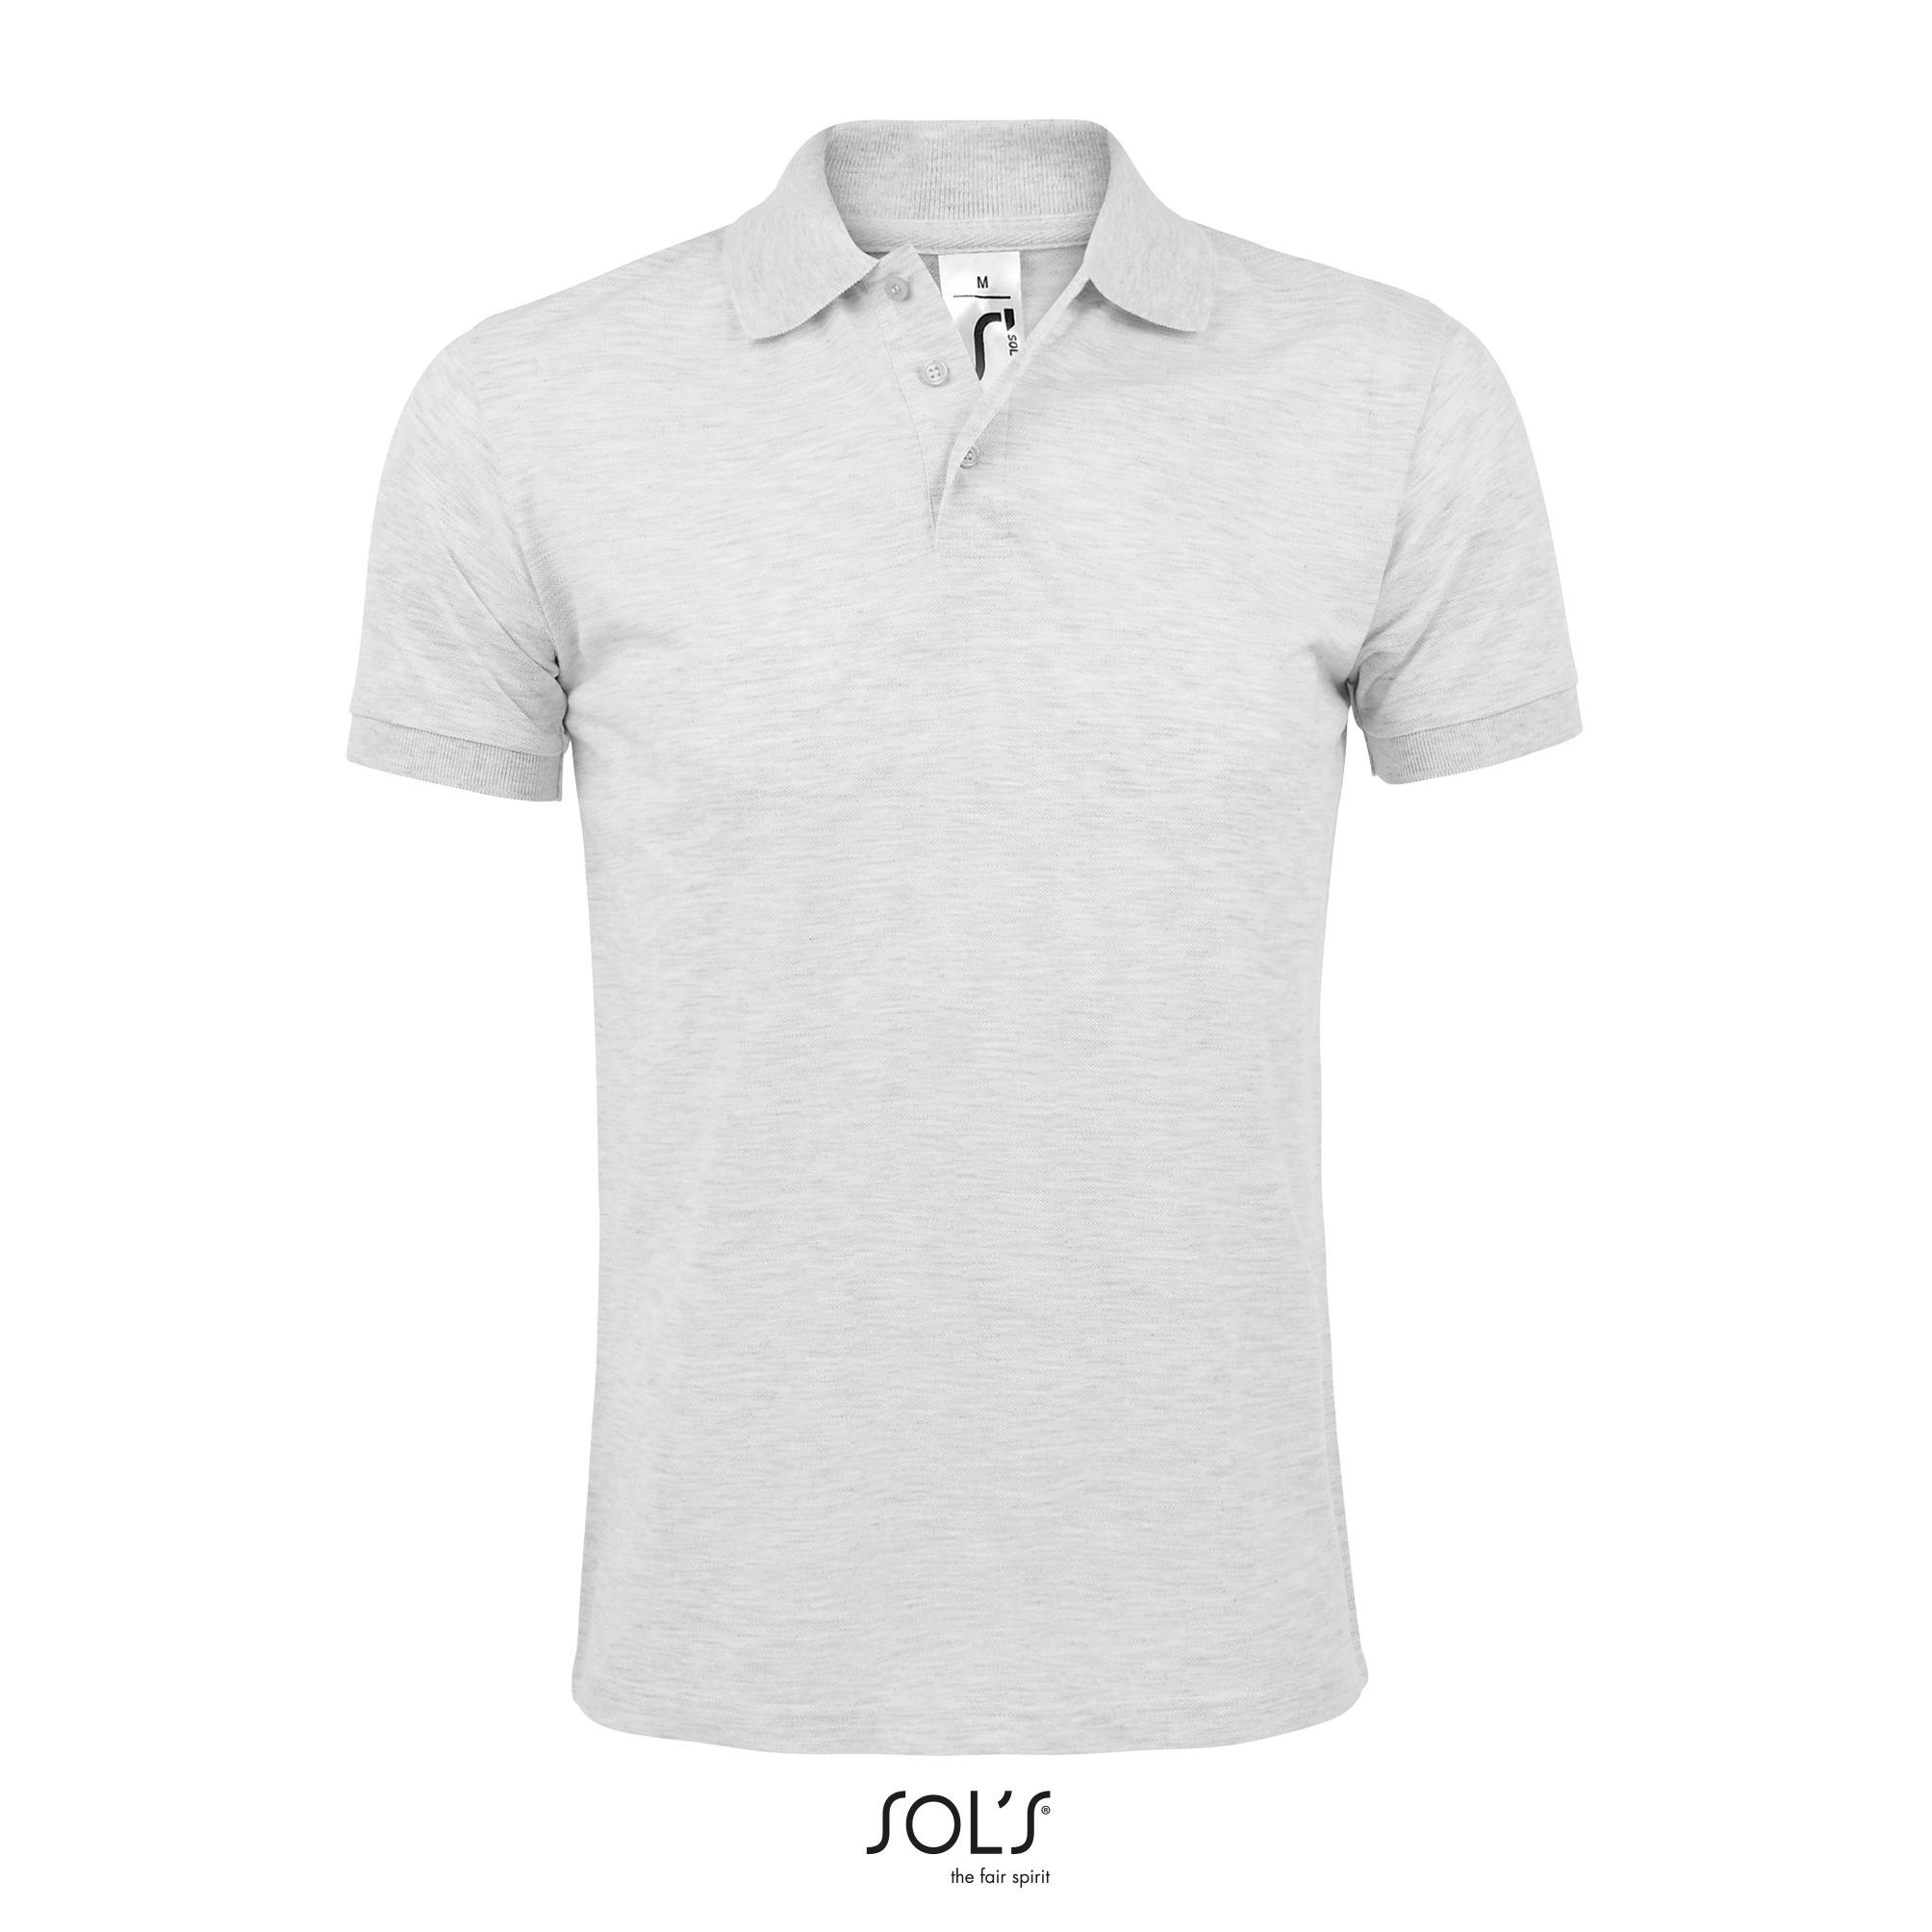 Polo homme - 1-1044-23